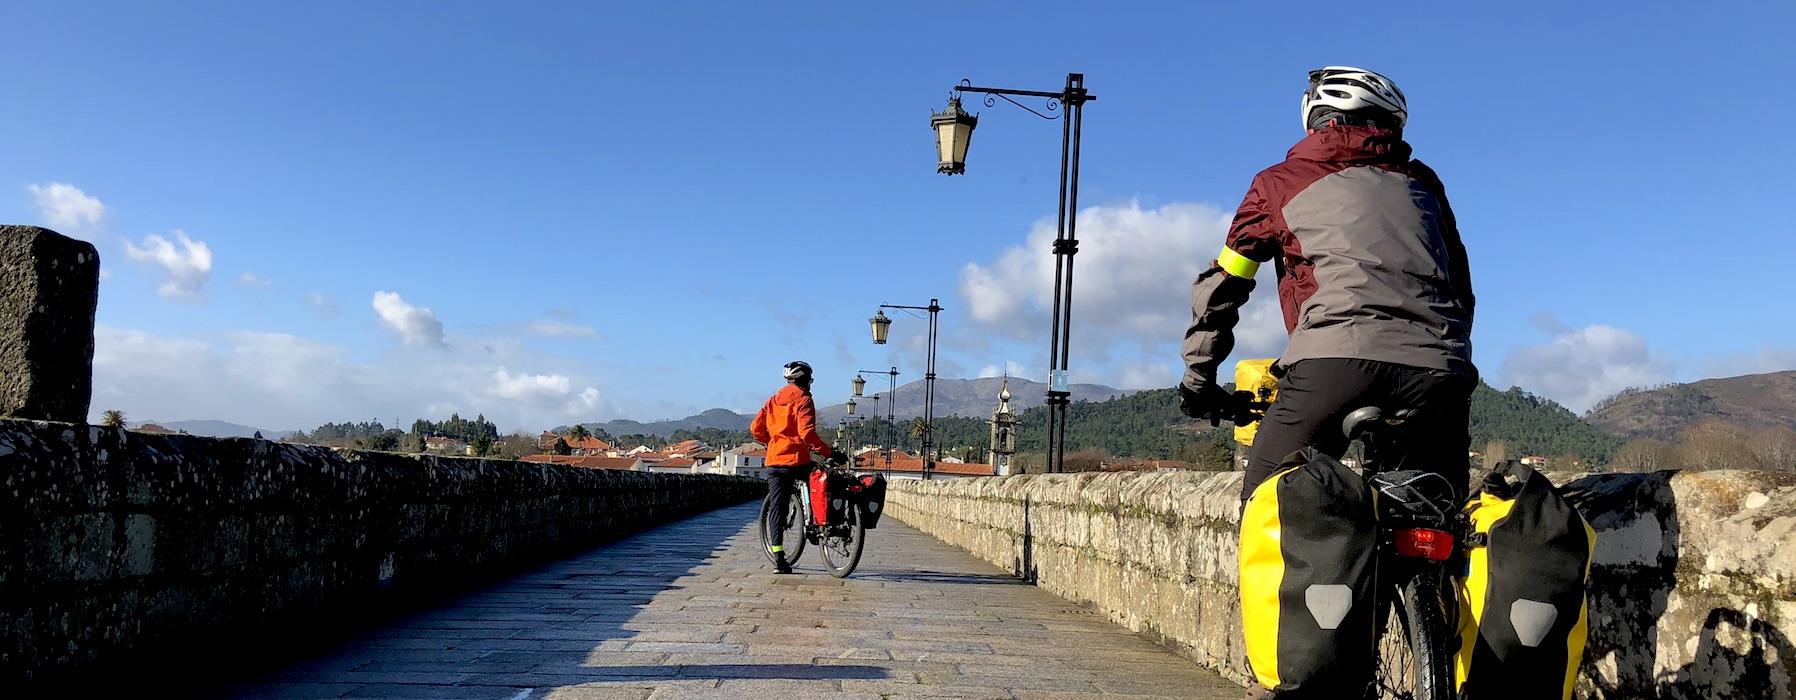 Cyclists on Medieval Bridge Ponte de Lima